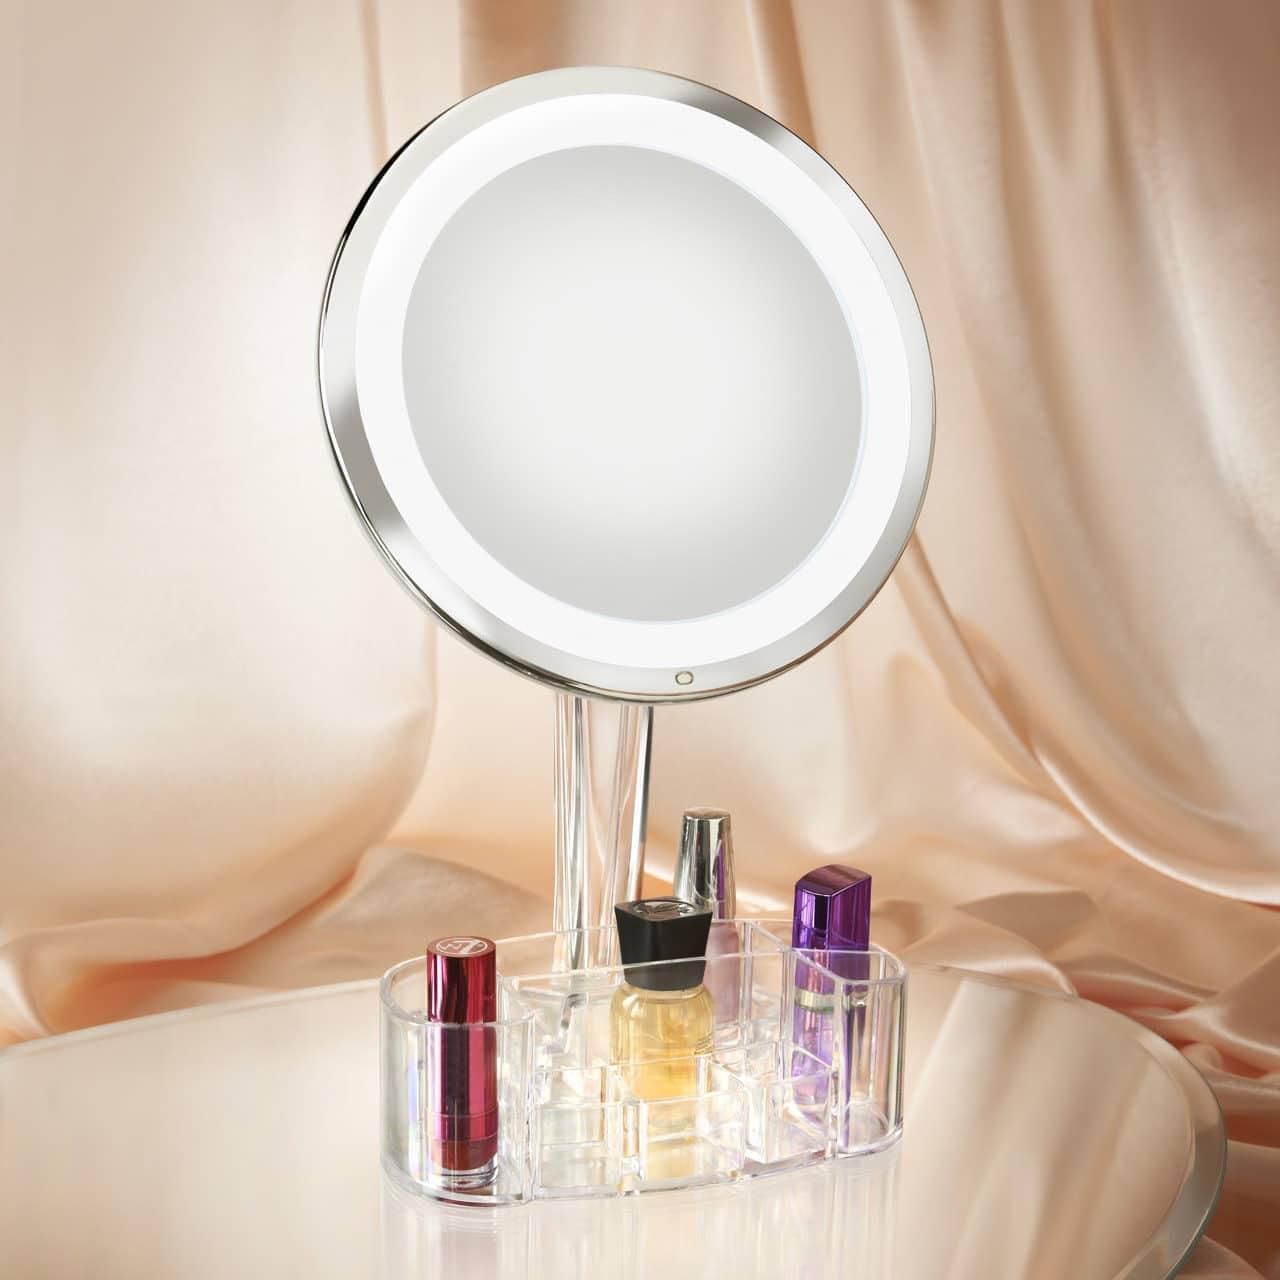 Win a Magnifique Mirror!